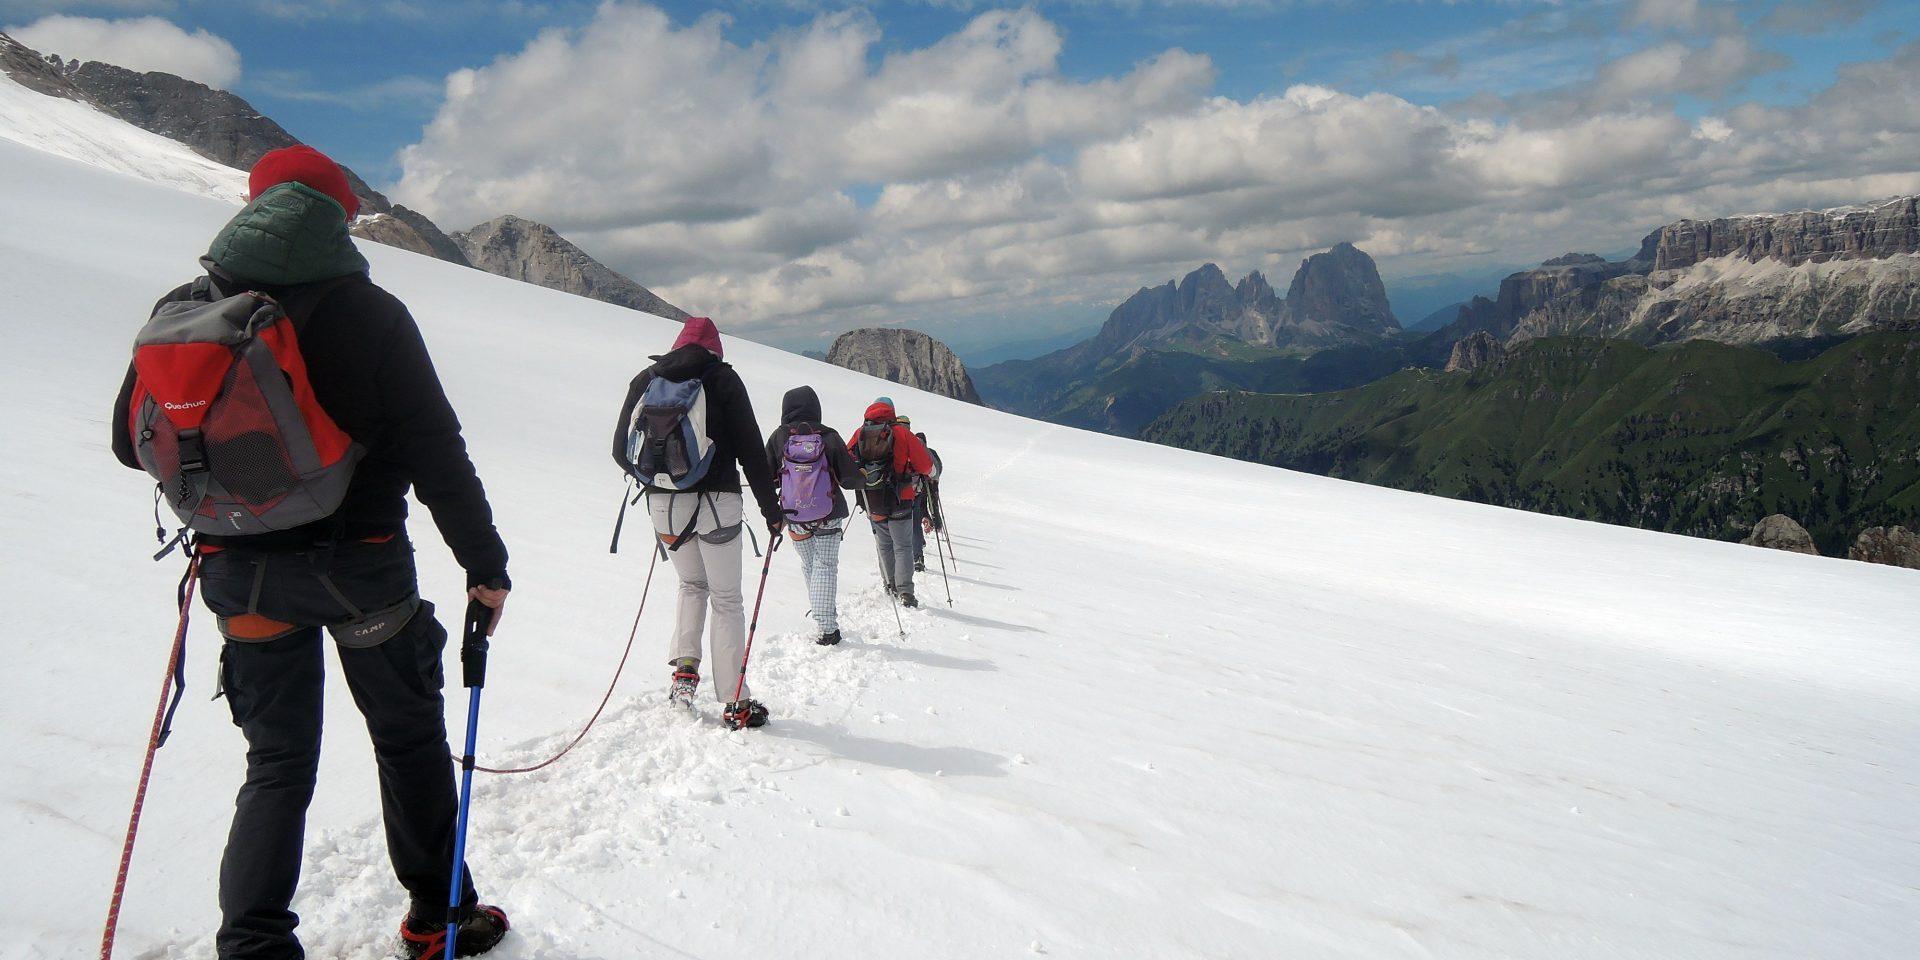 Historical tour of Marmolada Glacier with Mountain Guides